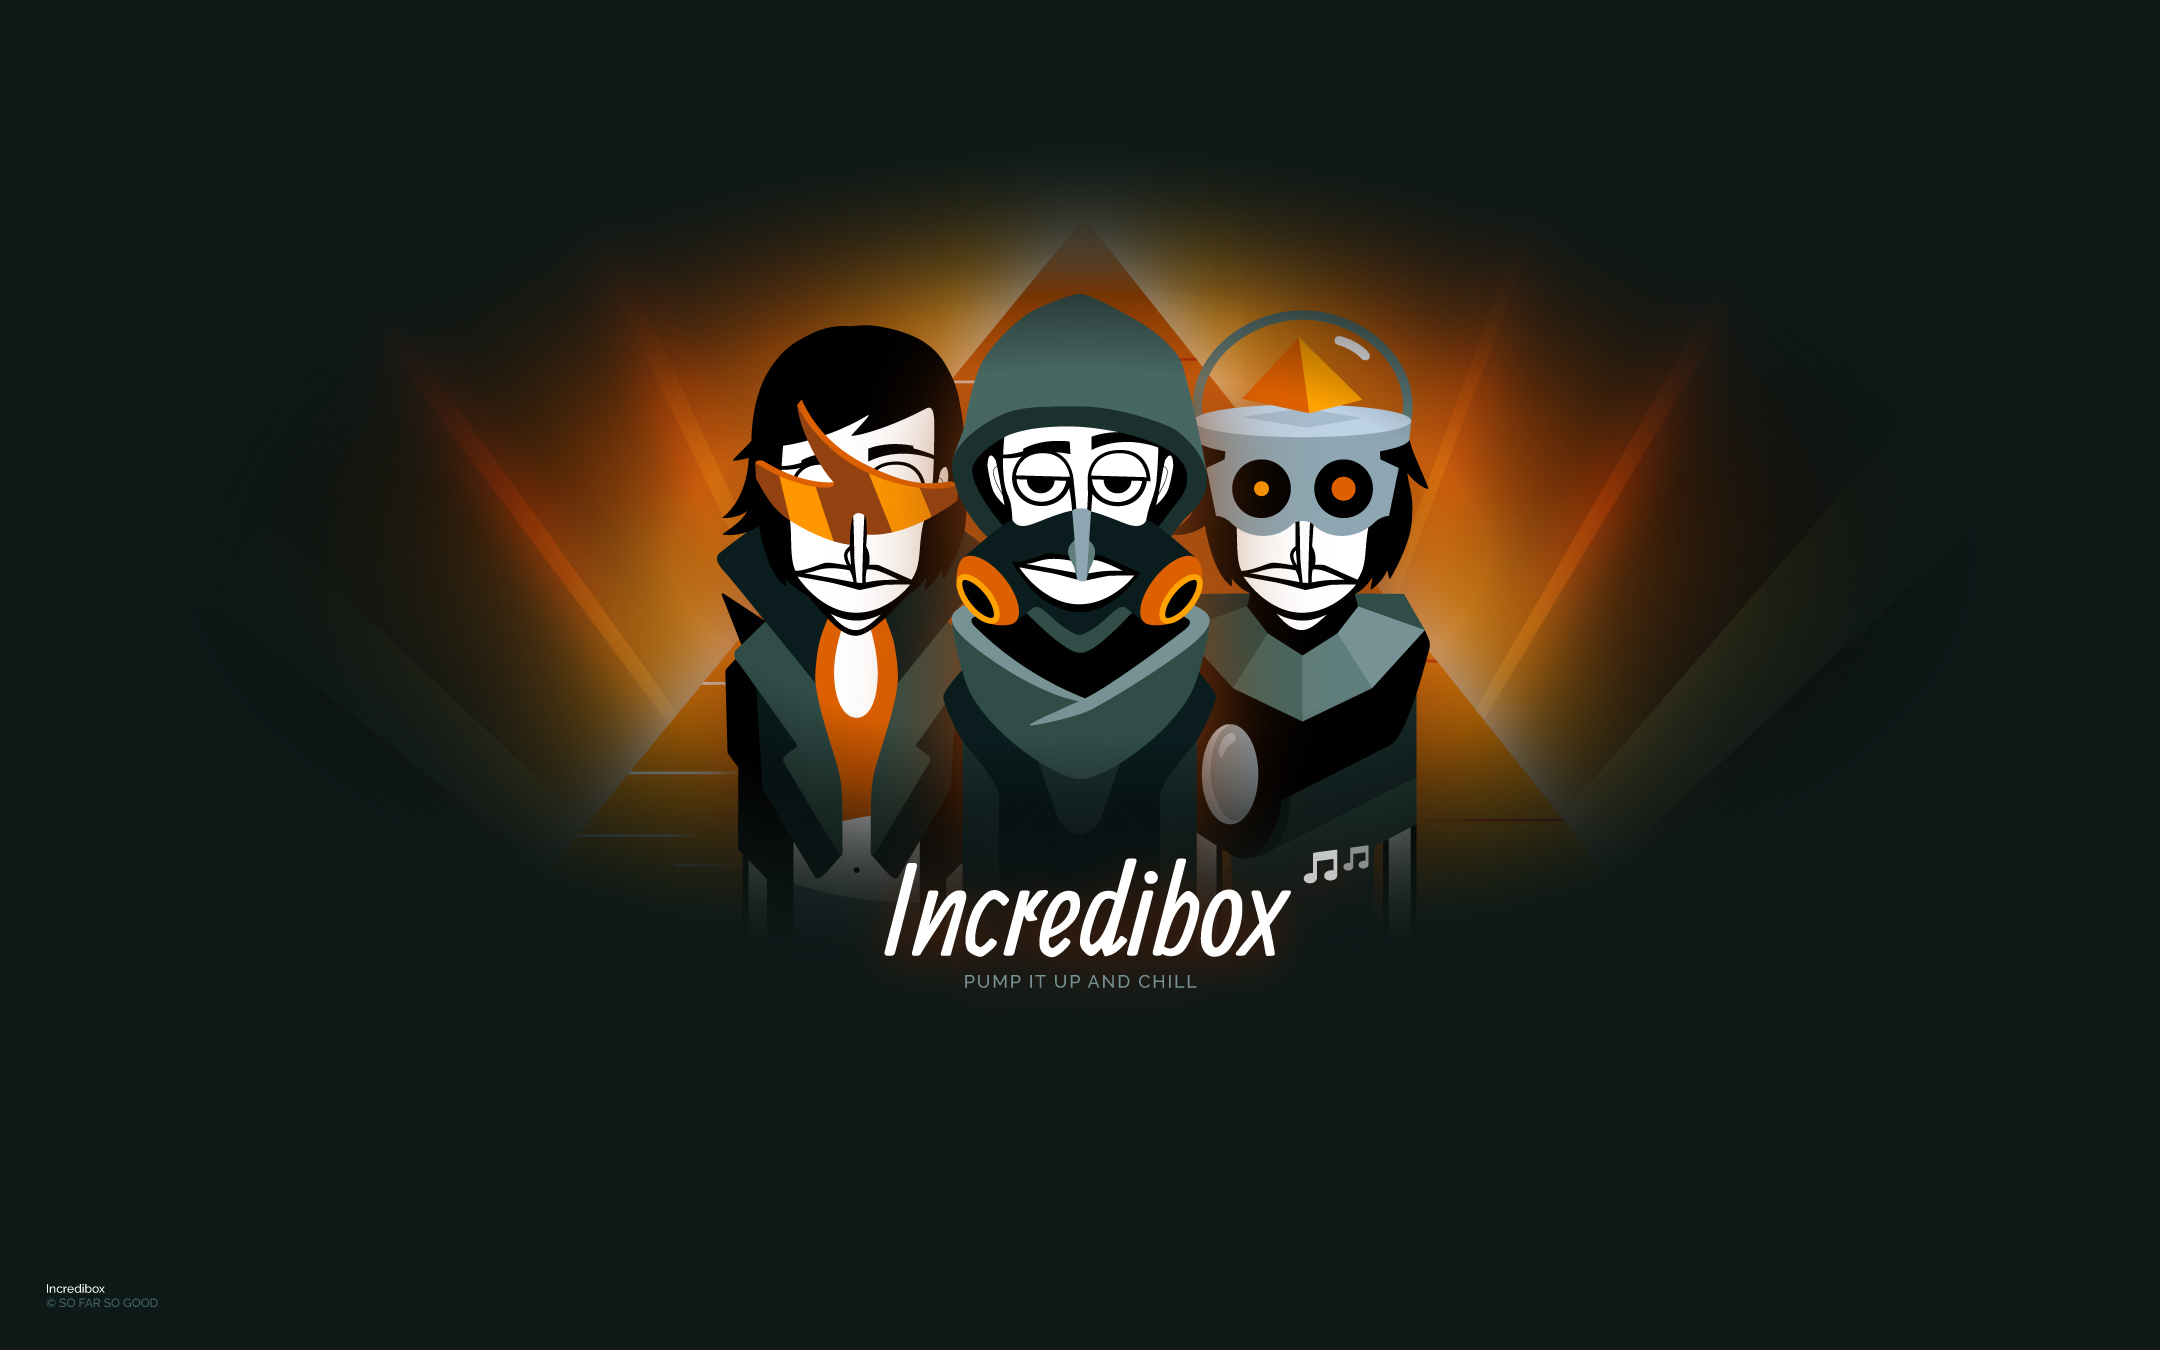 Incredibox Music Game Posters Gambling Music Game 2160x1350